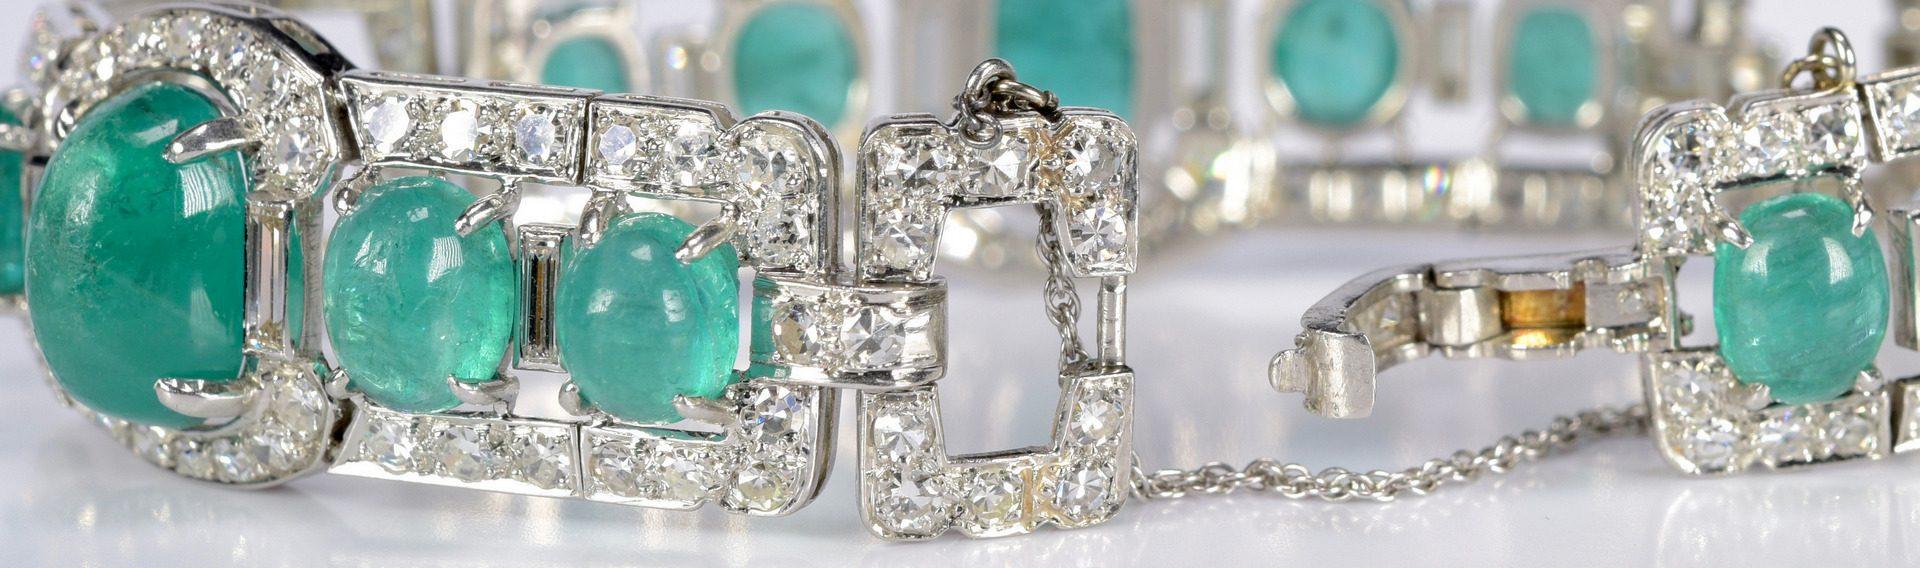 Lot 401: Art Deco Emerald and Diamond Bracelet